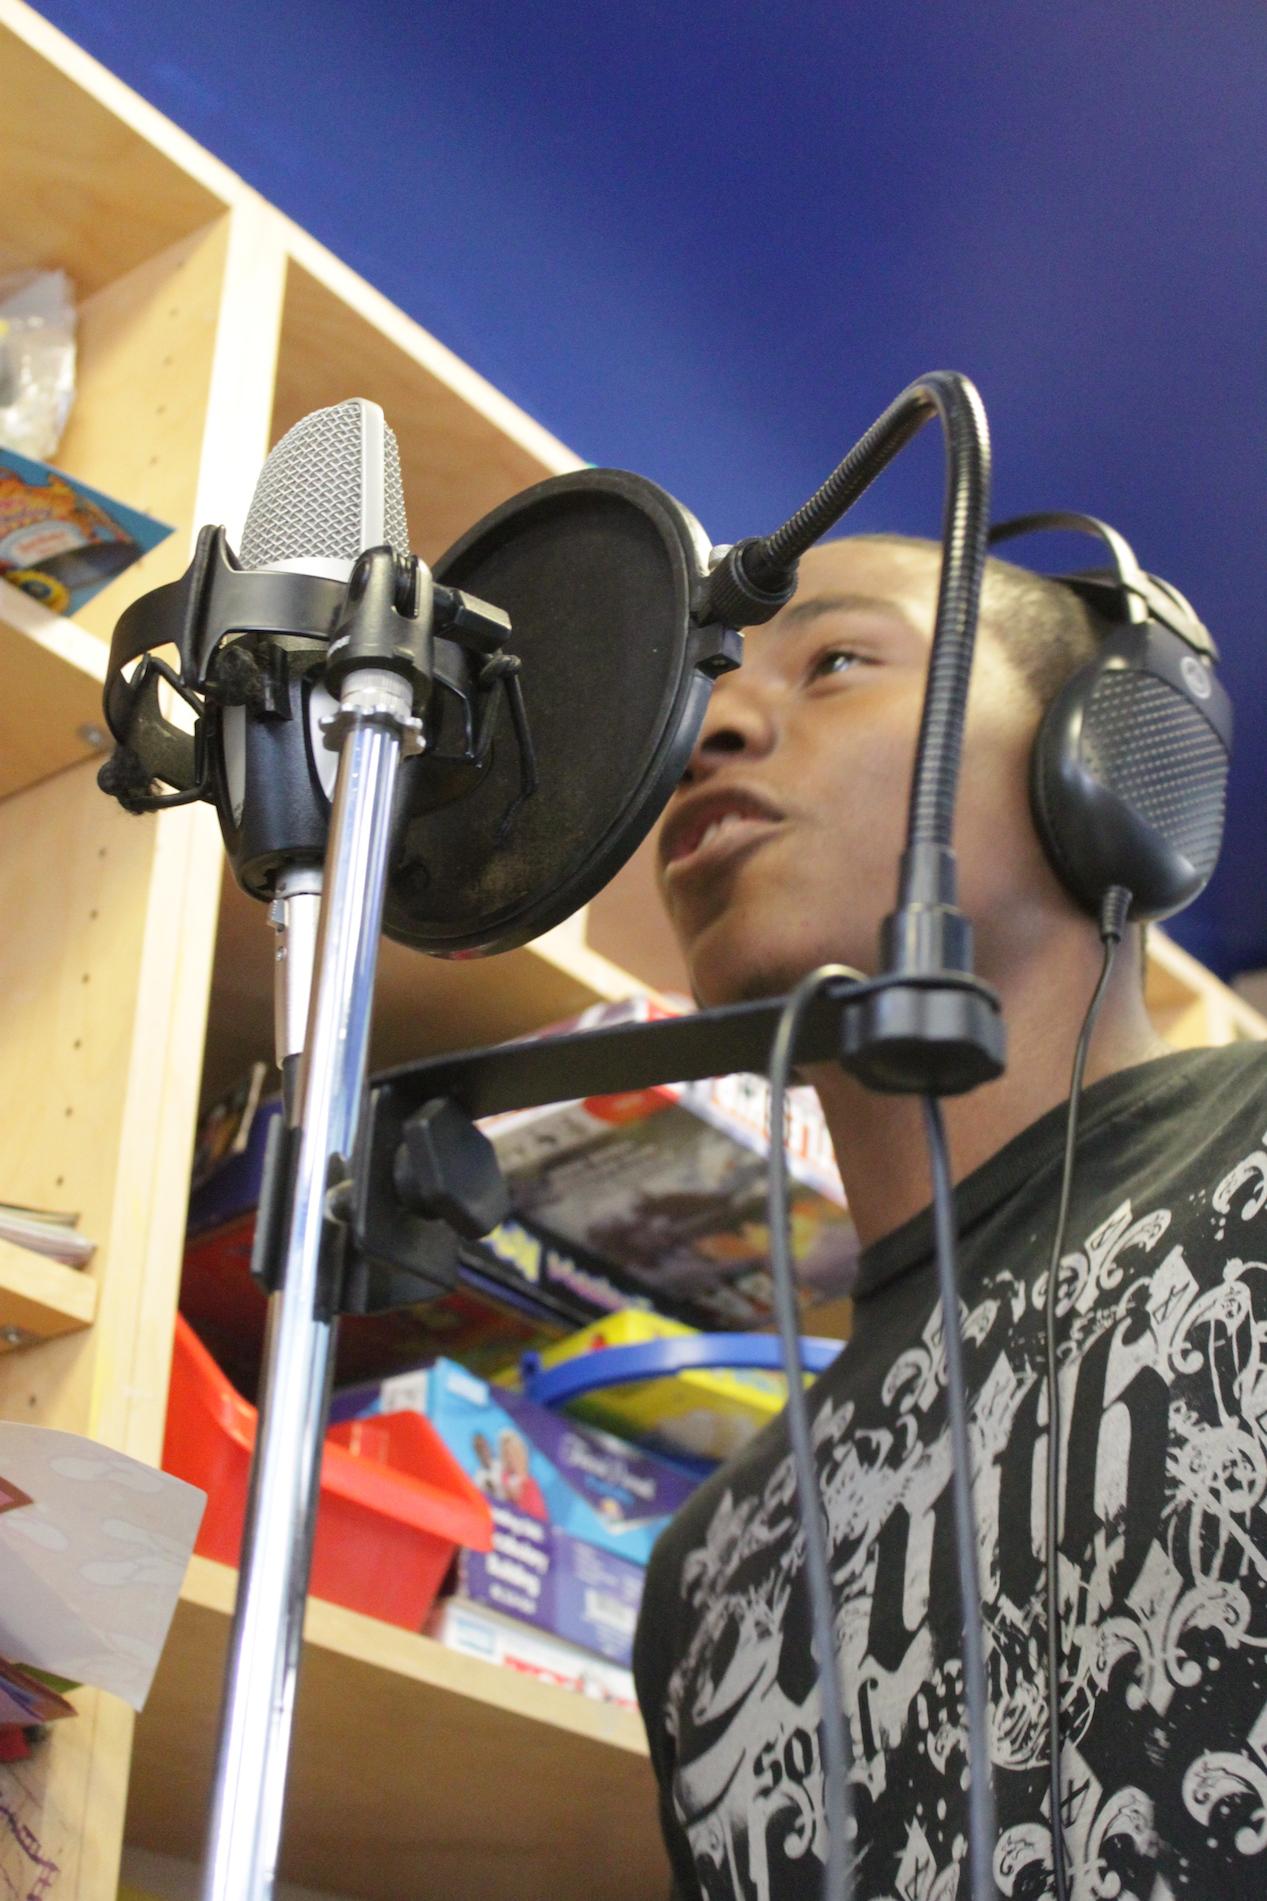 JUiCE Los Angeles Hip Hop Nonprofit Breakdance Music Art Community Youth Breakdance Los Angeles Emcee Production Rap.JPG